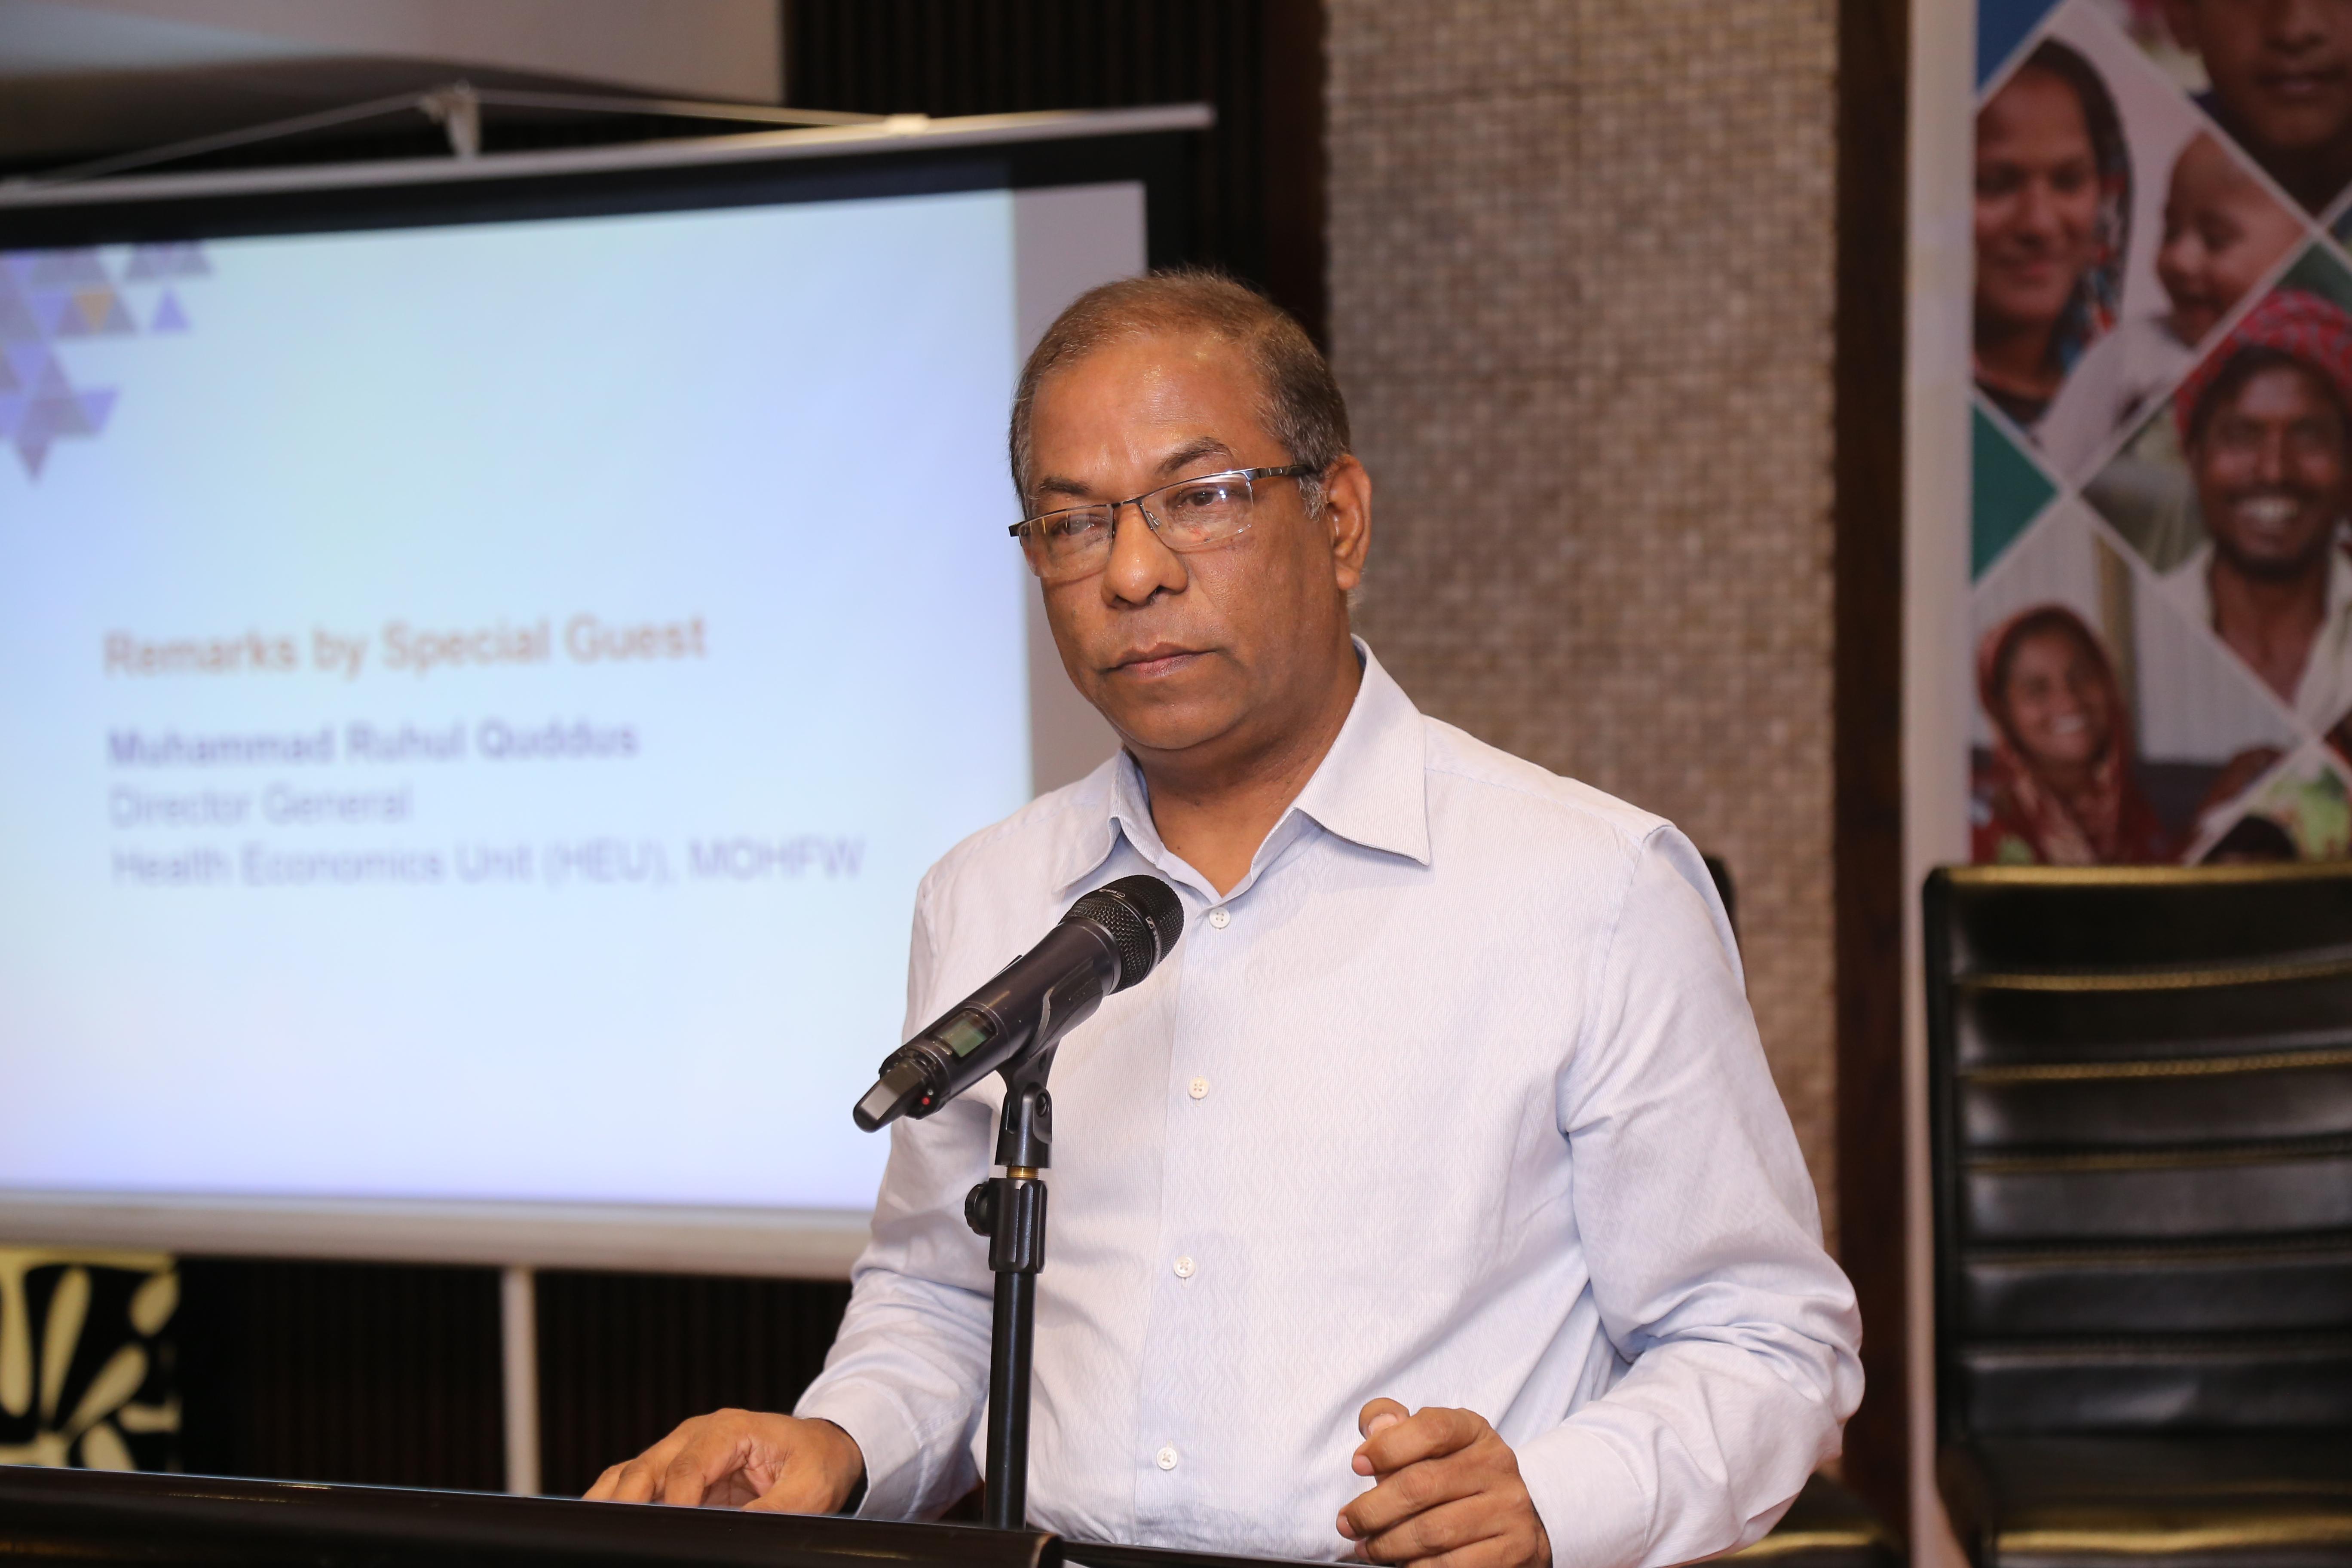 Special Guest - Mr. Muhammad Ruhul Quddus